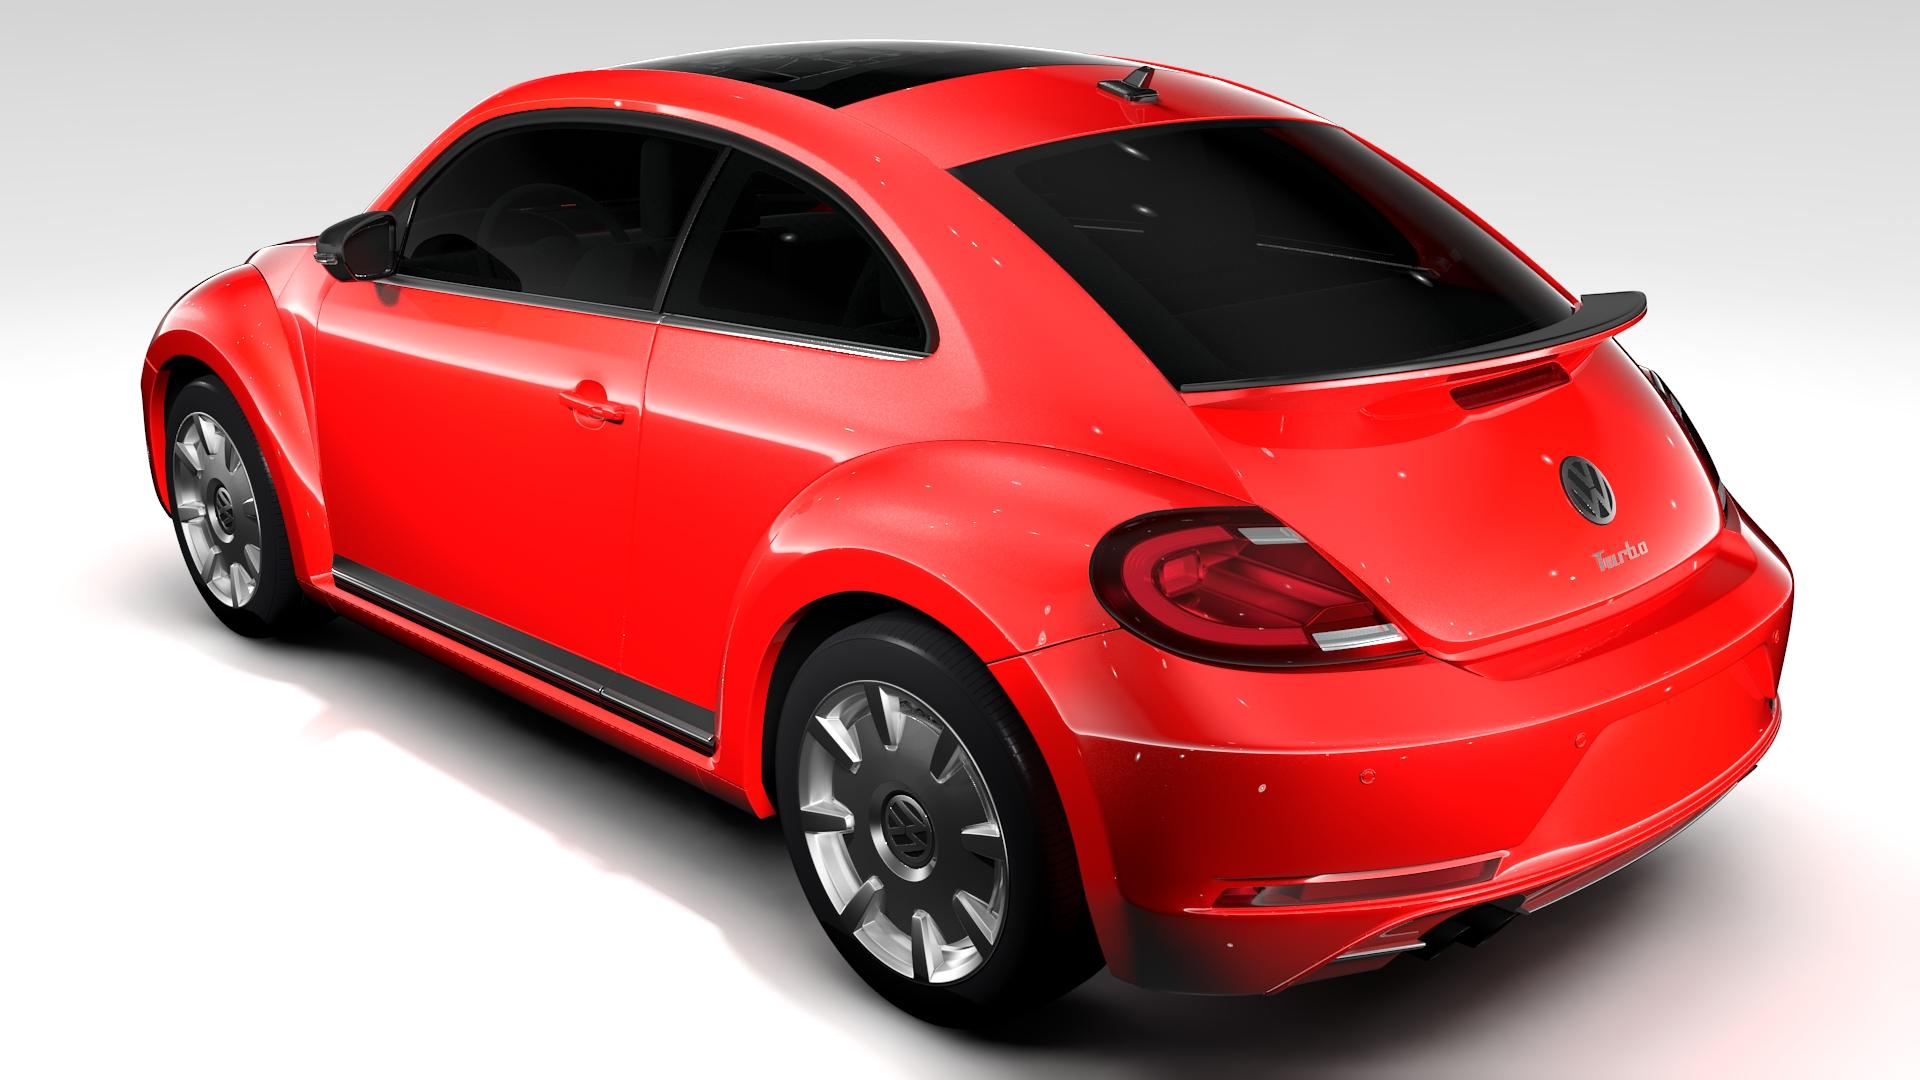 vw beetle turbo 2017 by creator 3d 3docean. Black Bedroom Furniture Sets. Home Design Ideas